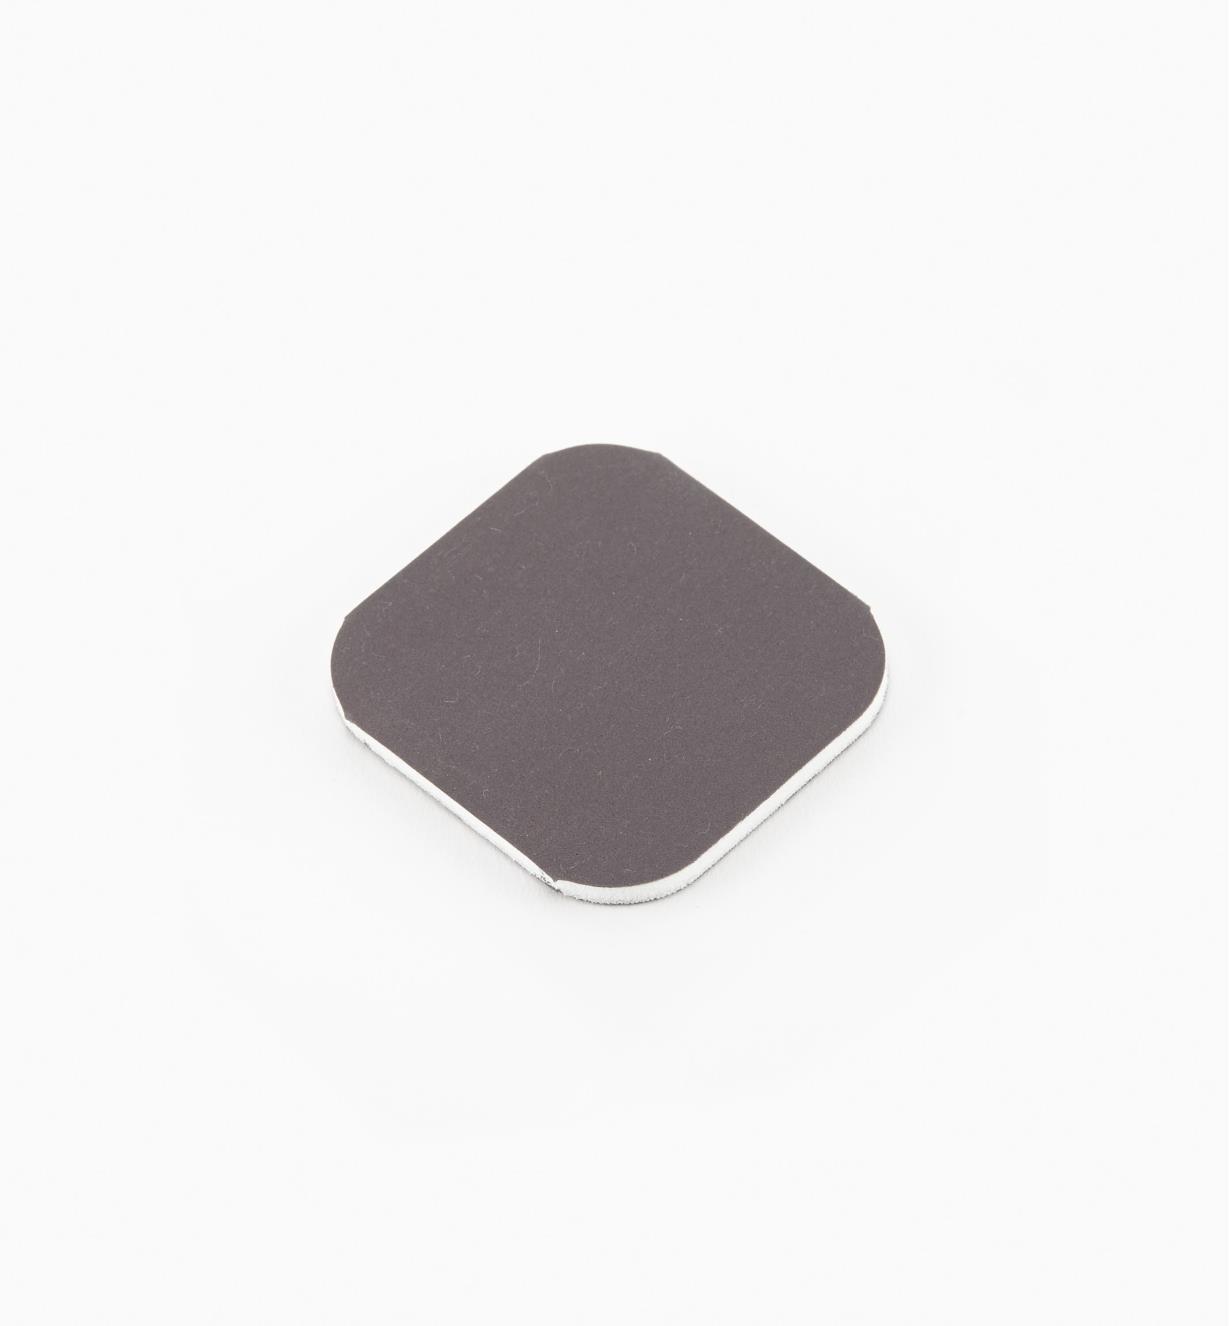 54K9014 - 3600x Micro-Mesh Pen-Sanding Pad, each